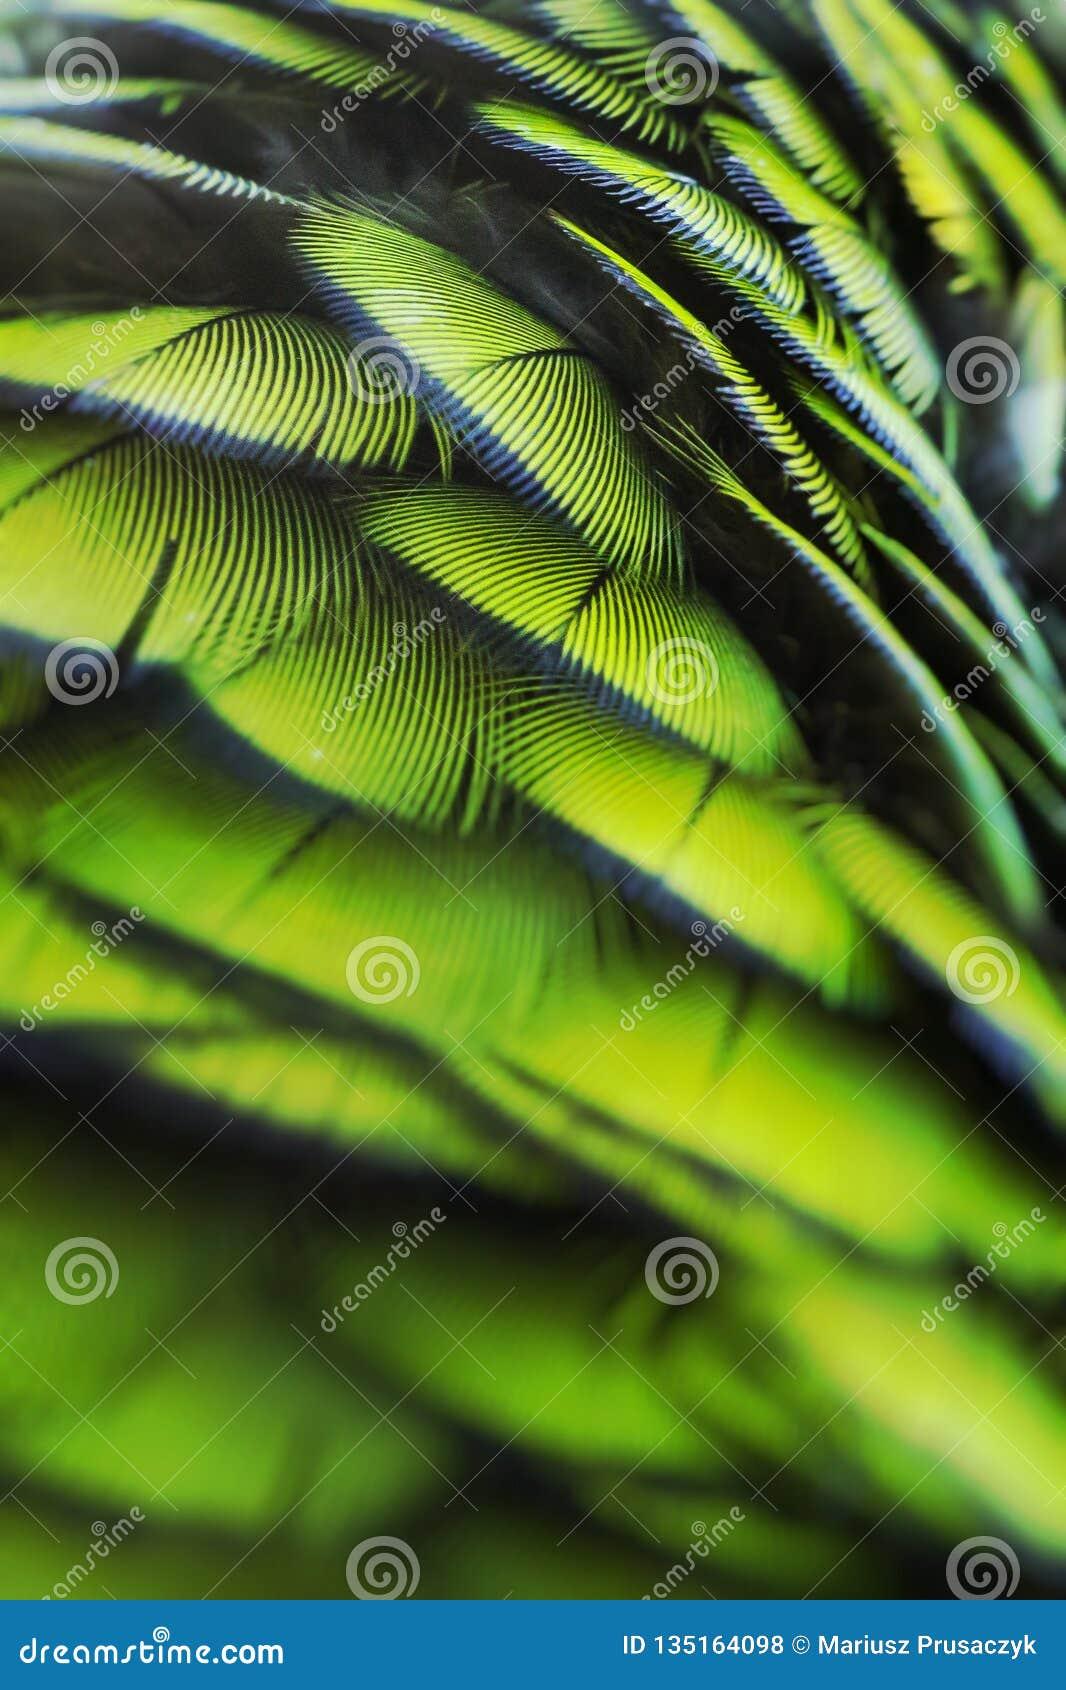 Zielony ptasi upierzenie, Arlekińska ara upierza, natury tekstury tło Selekcyjna ostrość